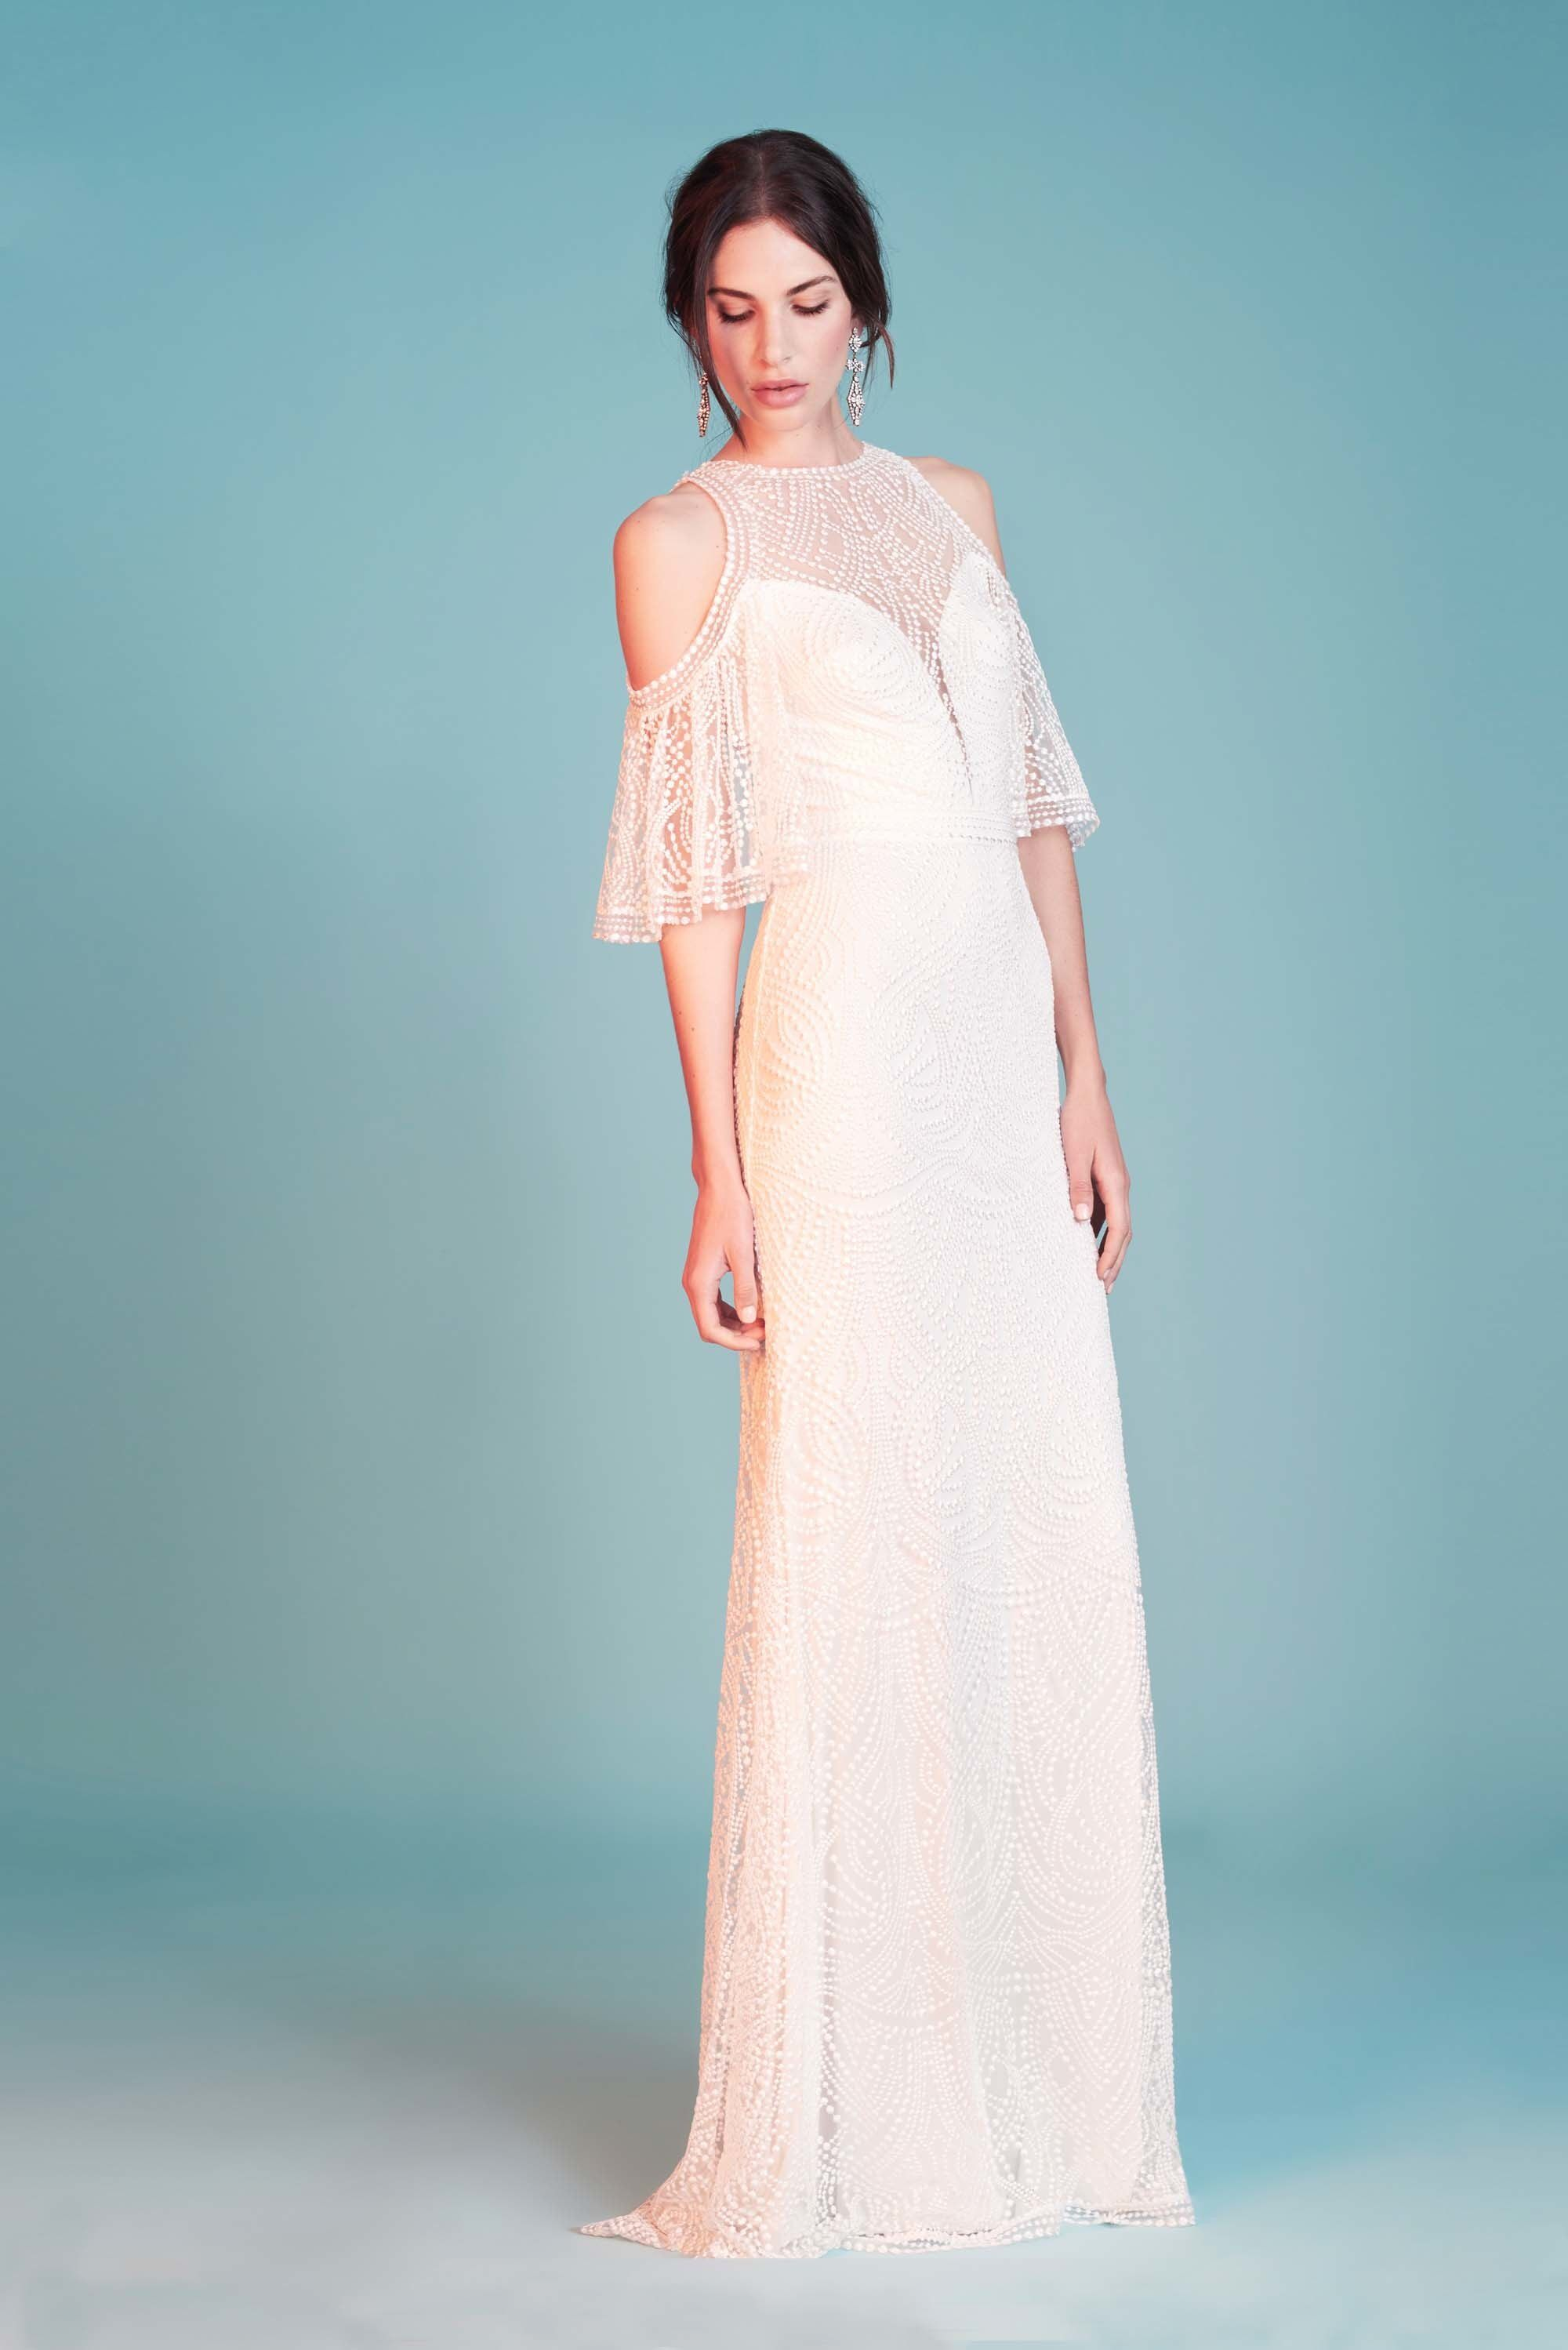 Tadashi Shoji Bridal Spring 2018 Fashion Show   Vestidos de novia ...